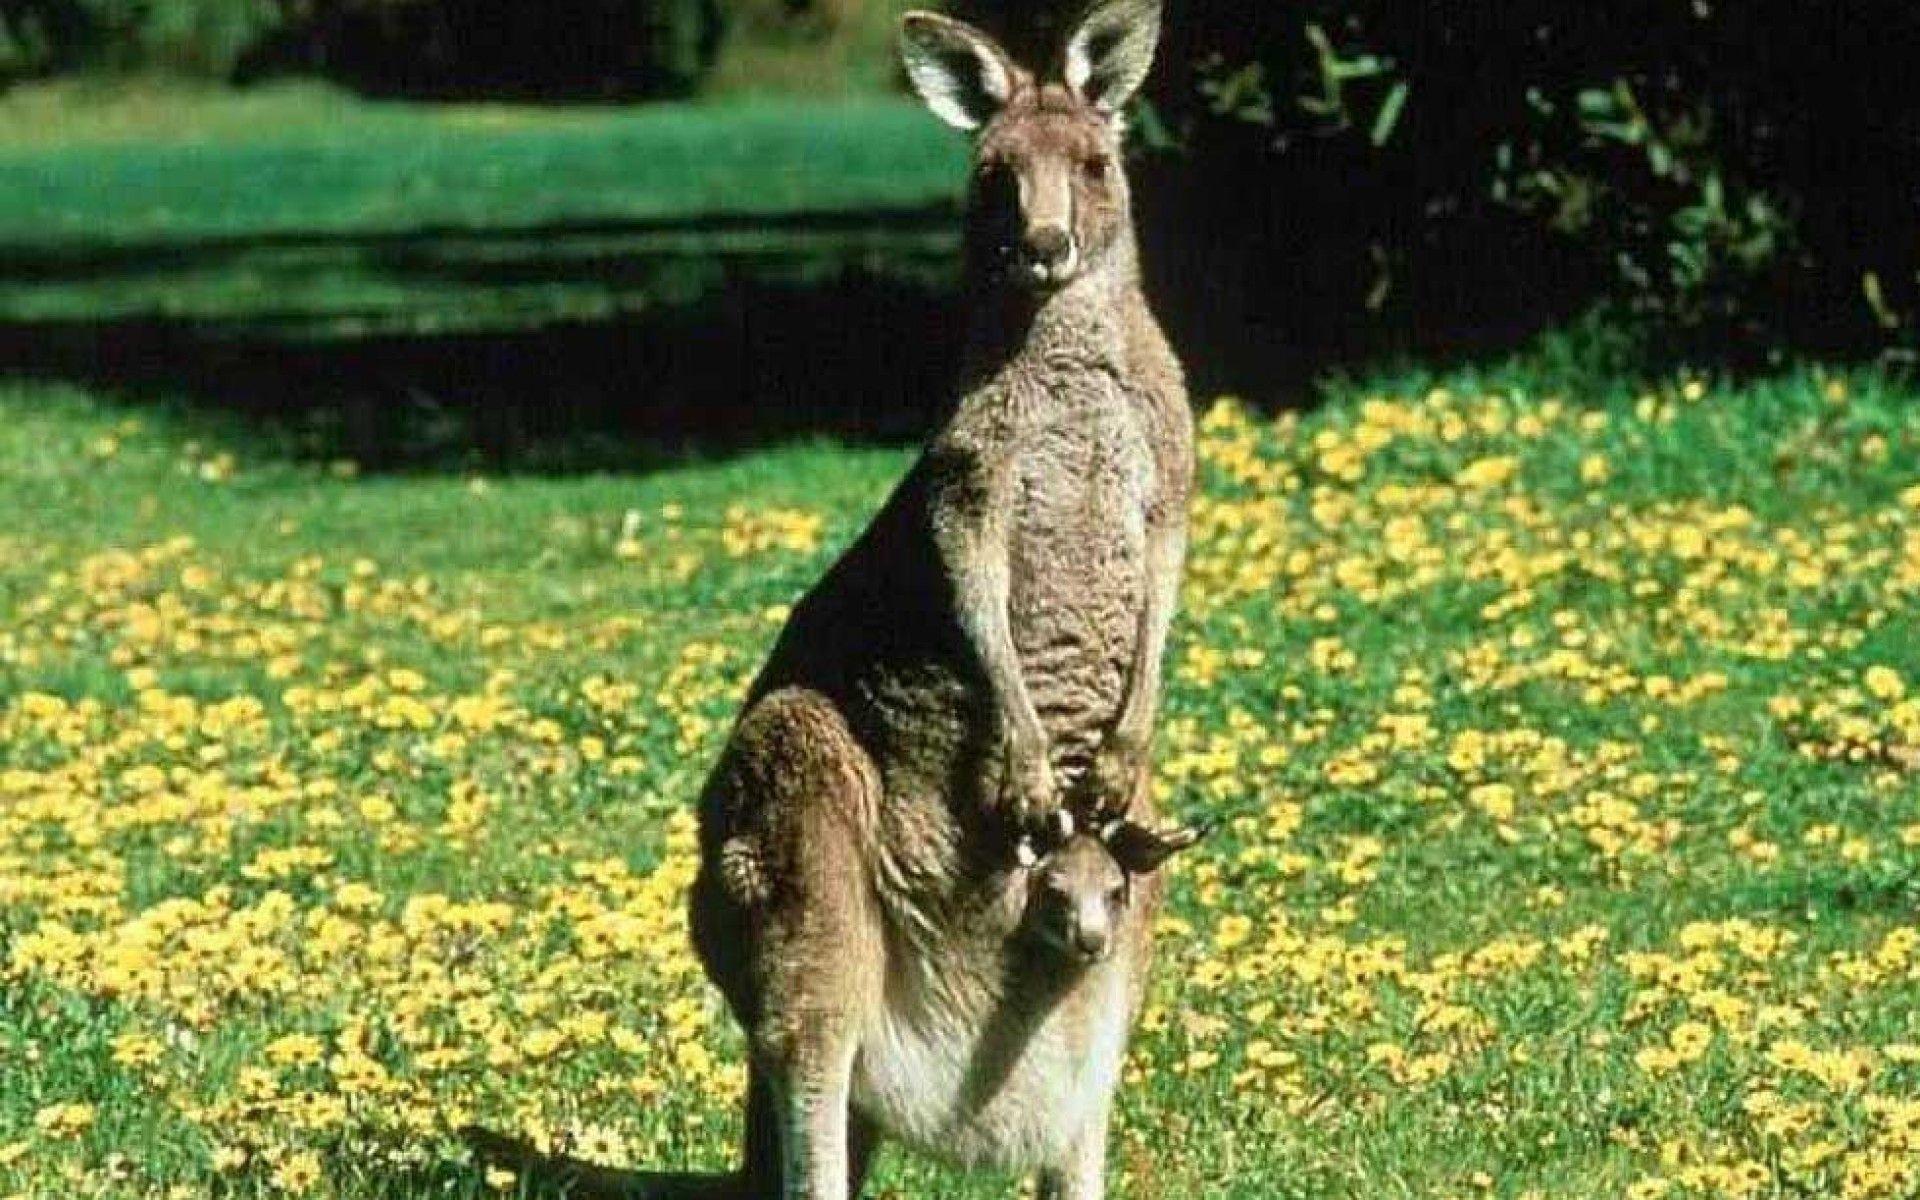 Kangaroo desktop wallpaper - Animal Backgrounds